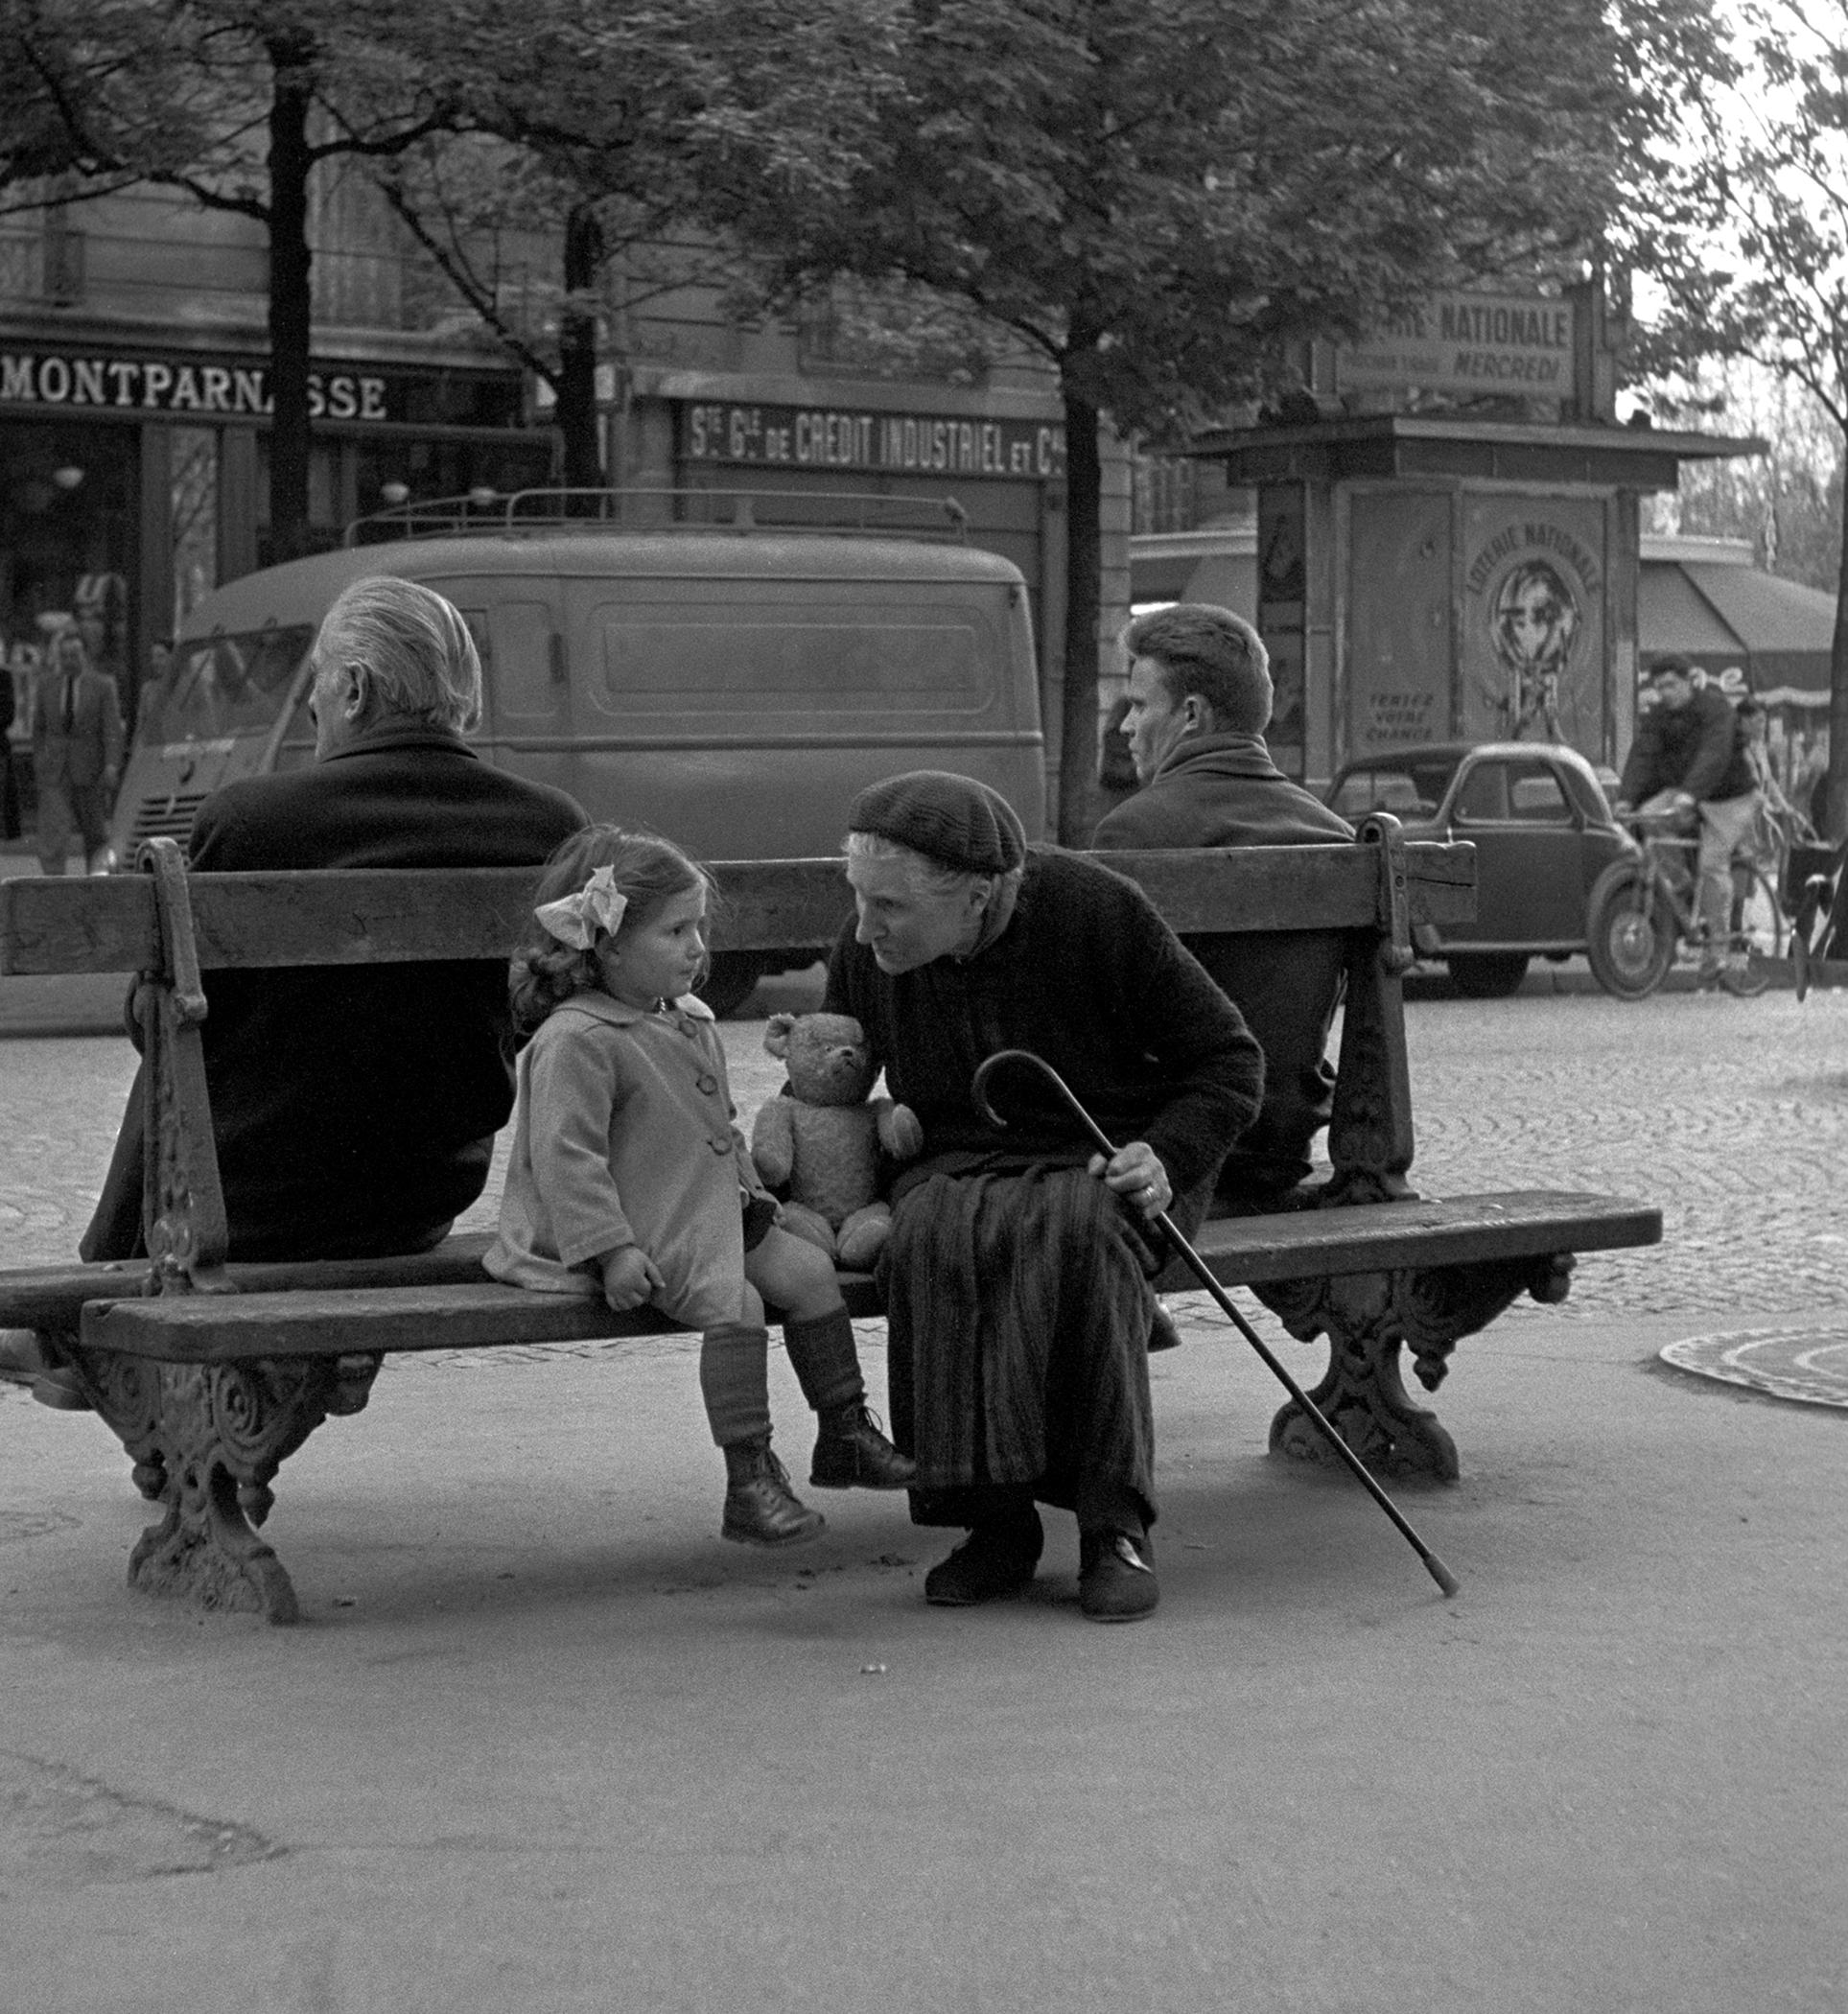 GRANDMOTHER & GRANDDAUGHTER - 1950